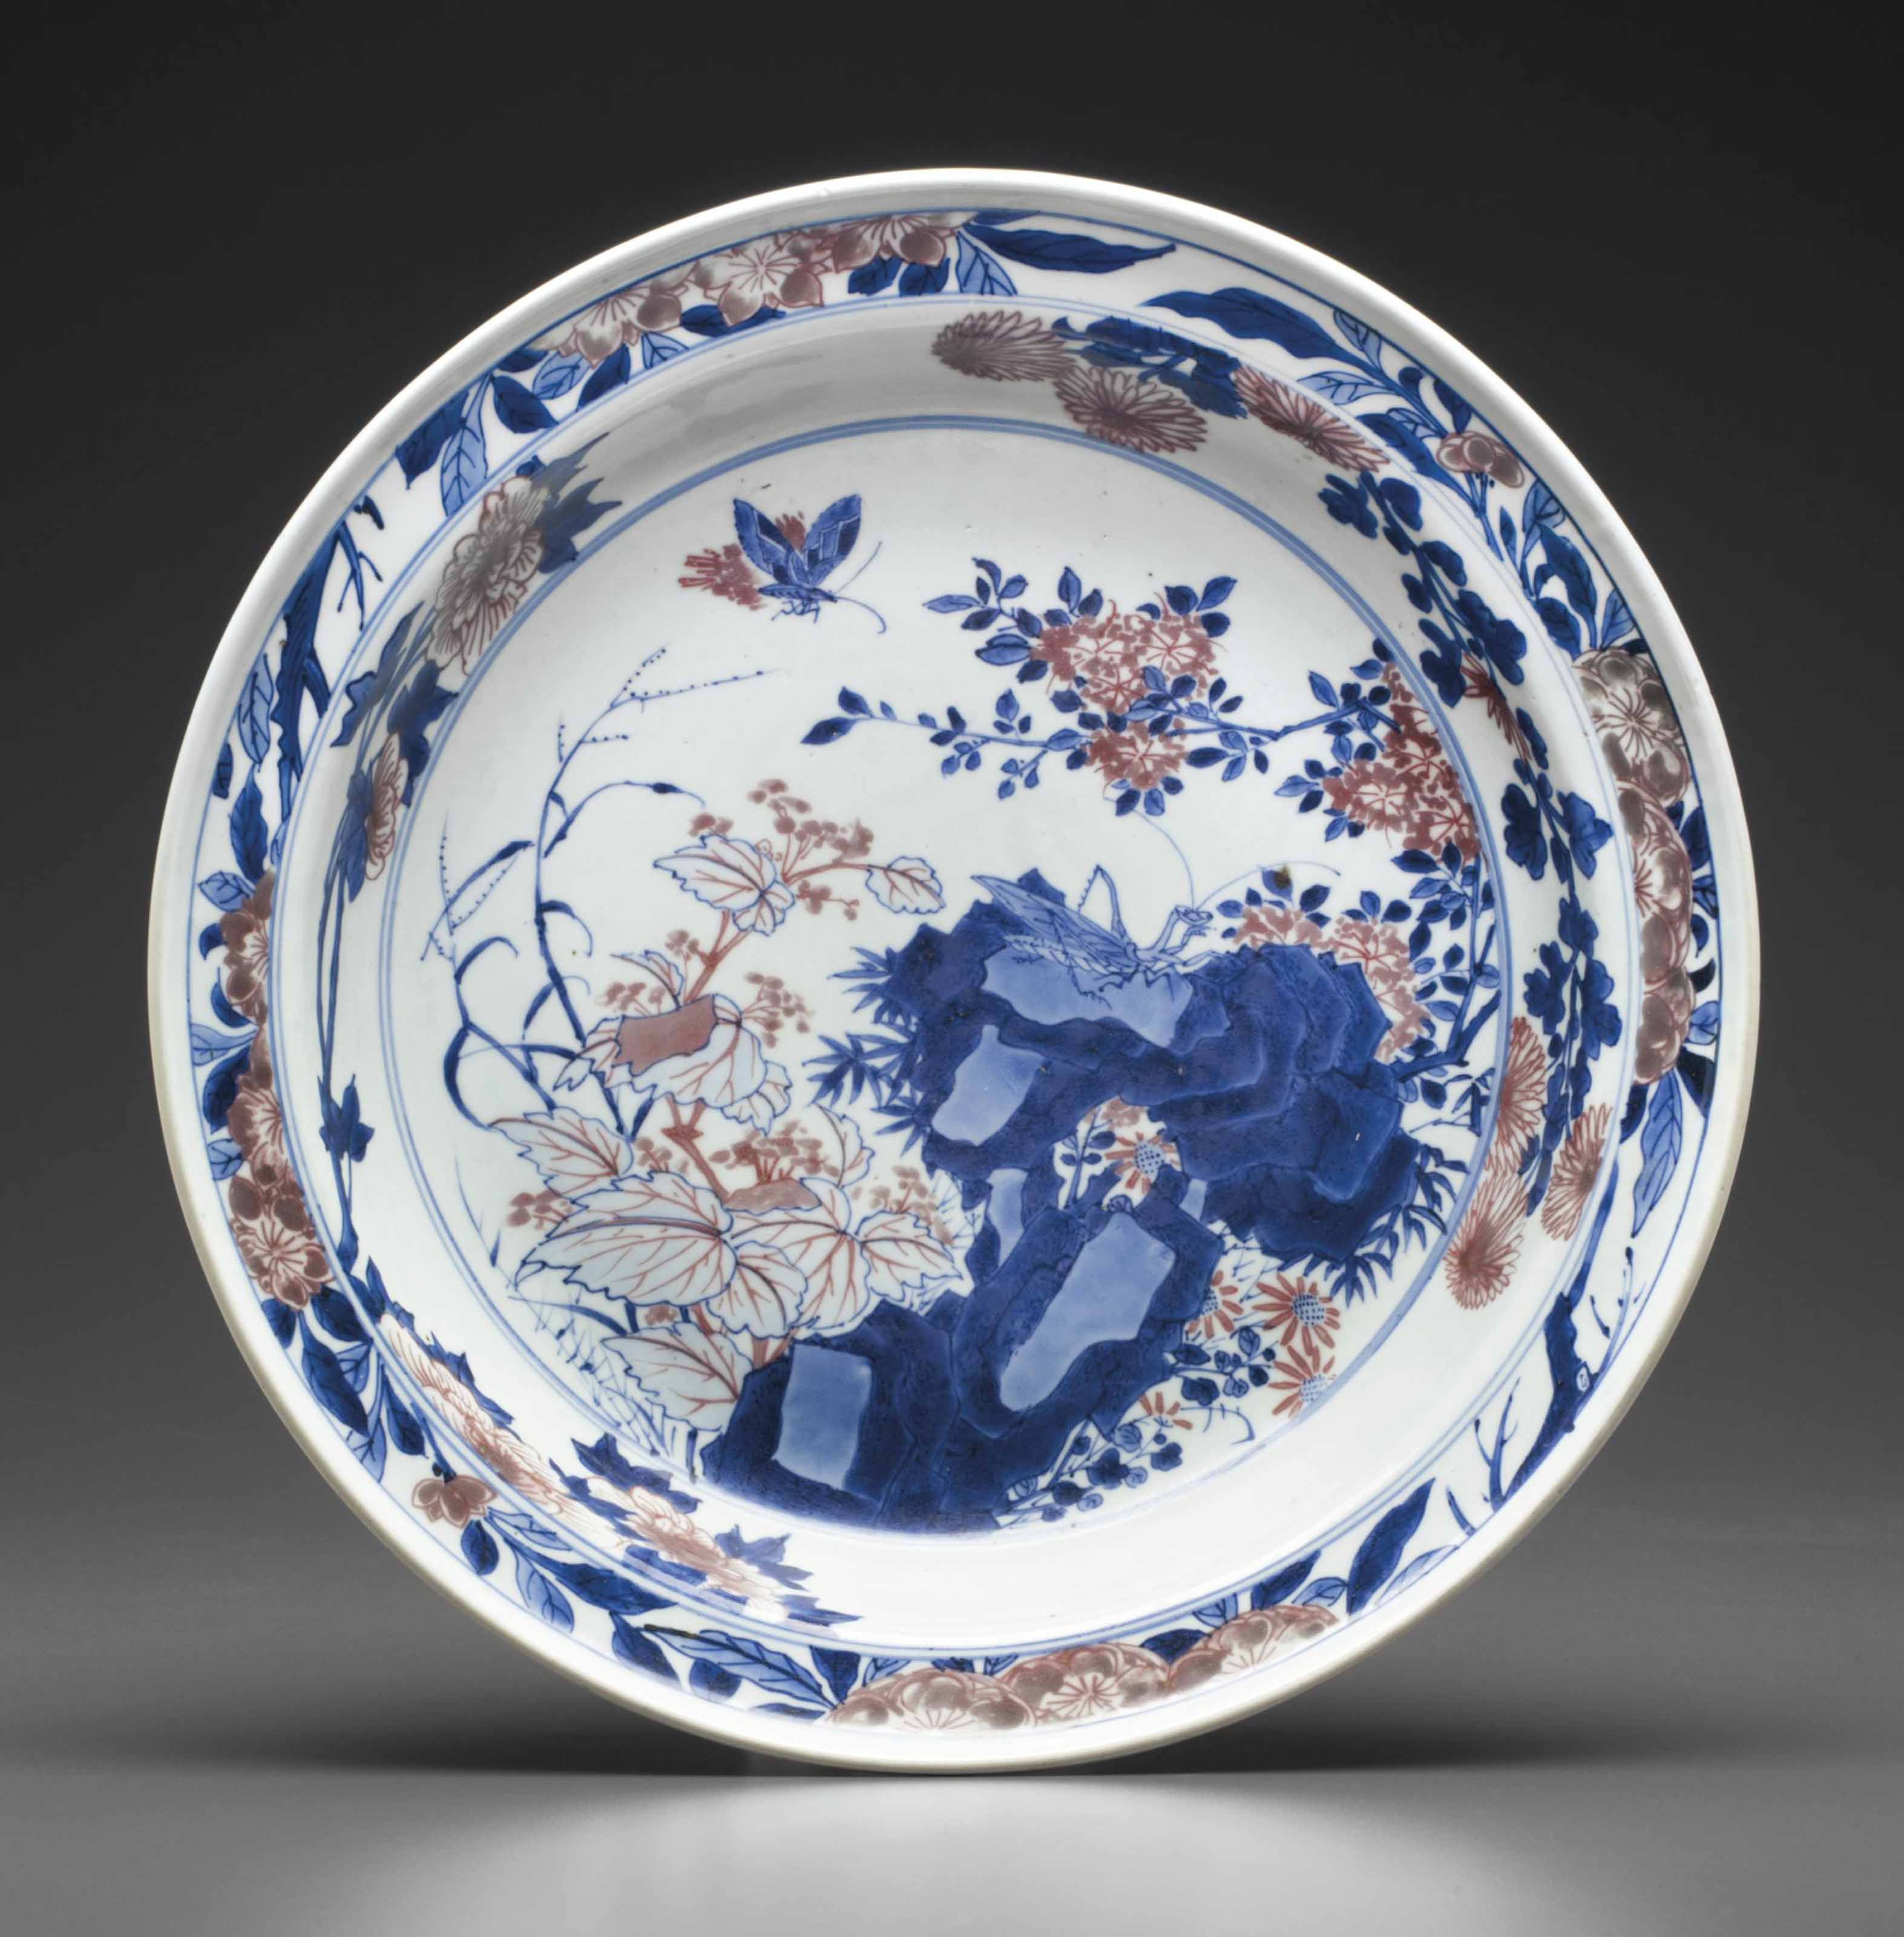 AN UNDERGLAZE-BLUE AND COPPER-